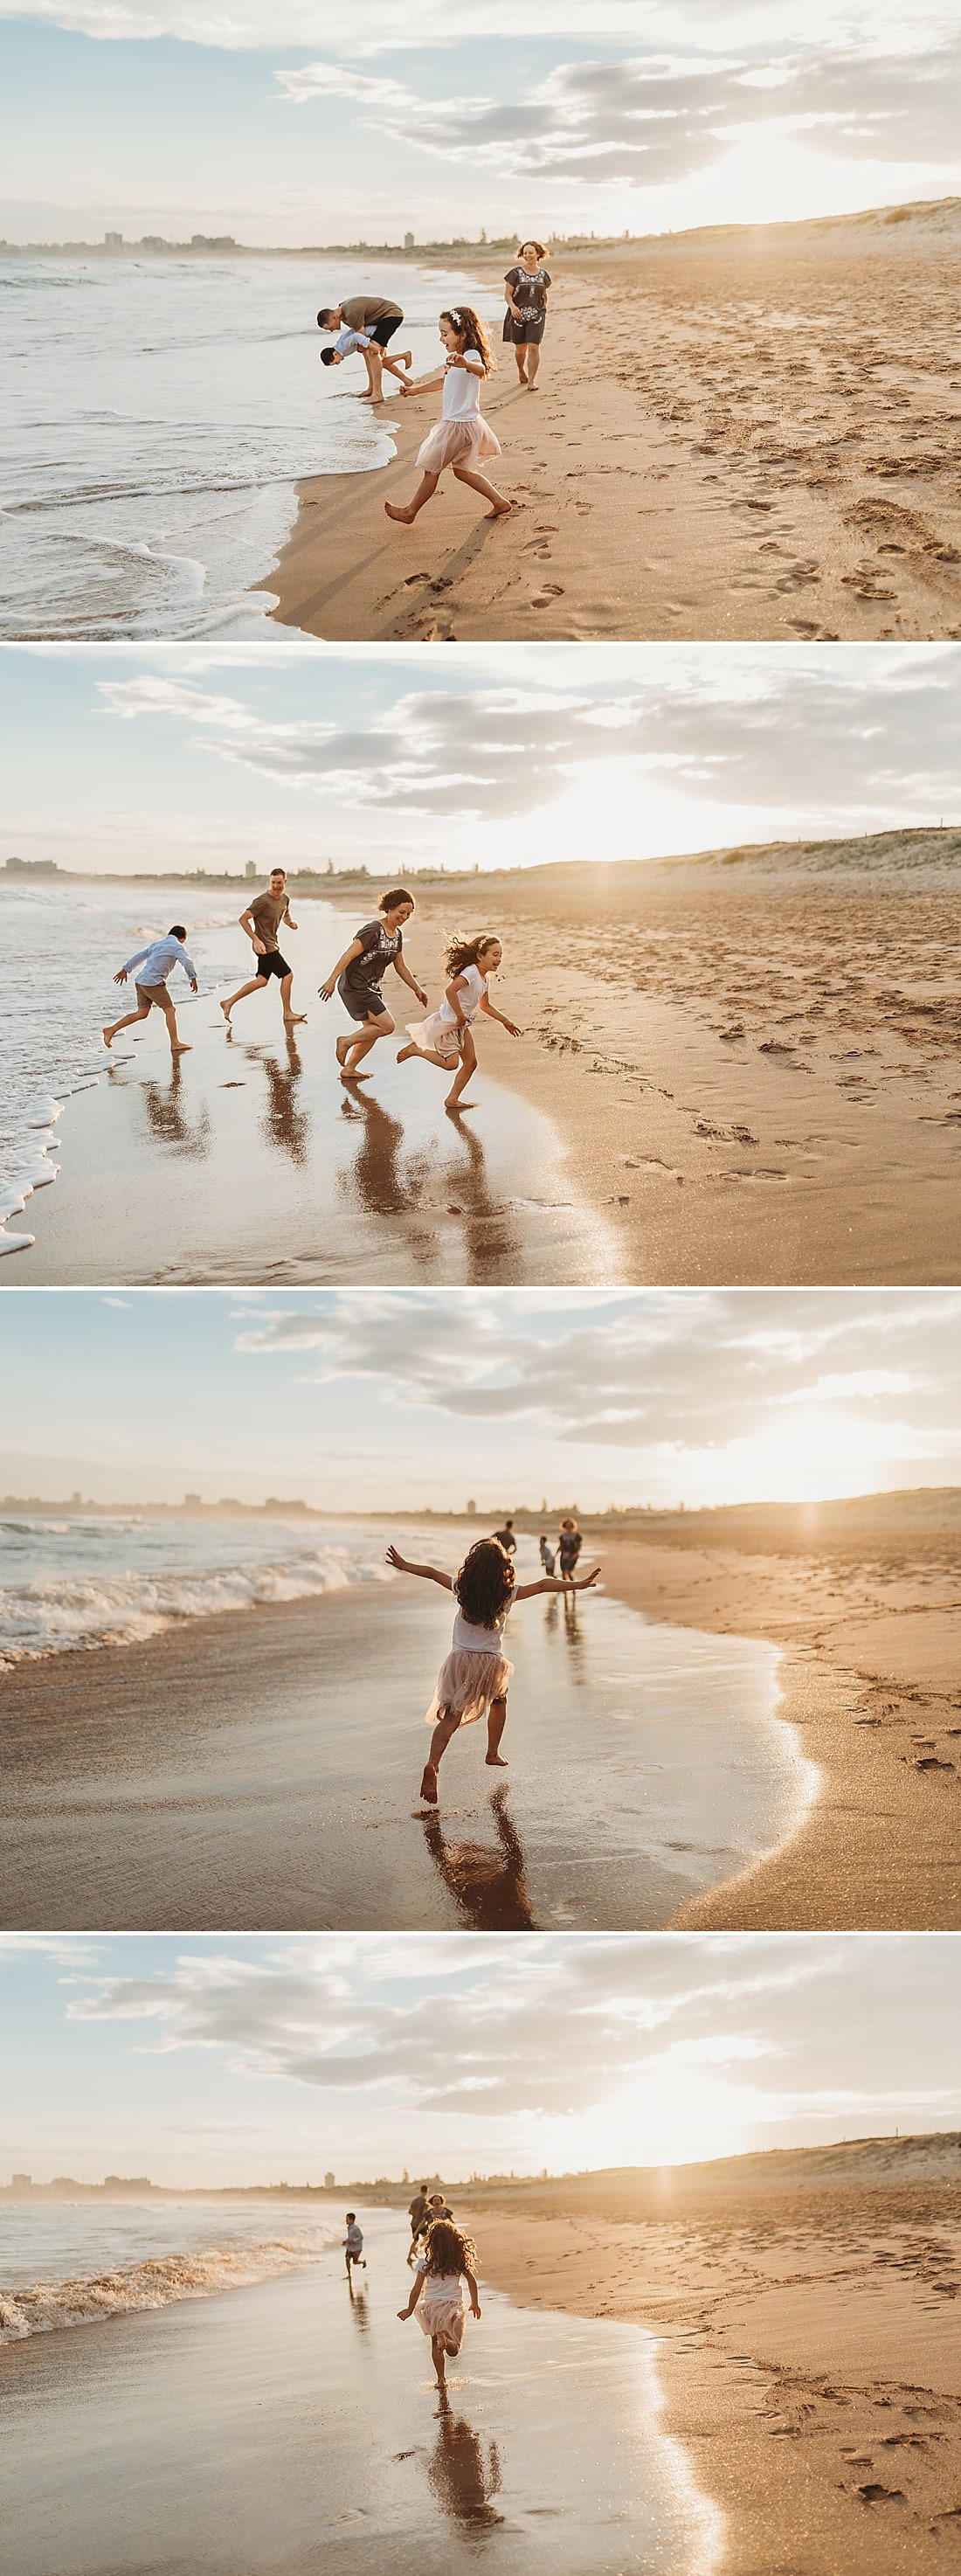 Beach-lifestyle-family-photography-cronulla-sutherland-shire